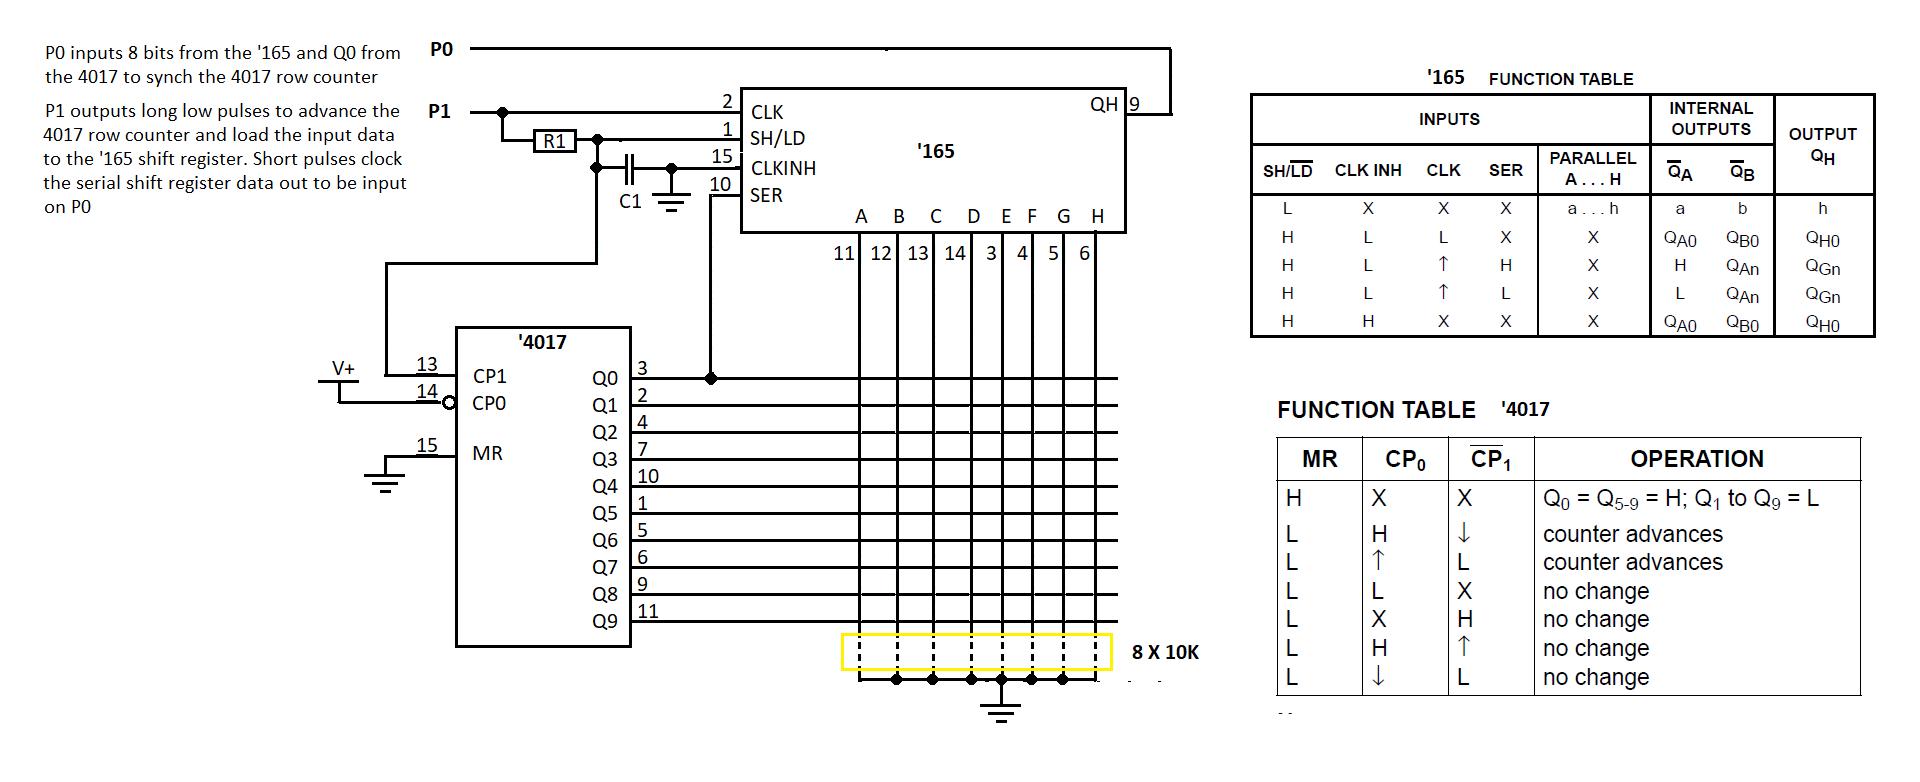 42 Key Keypad On 5 Wires Complete